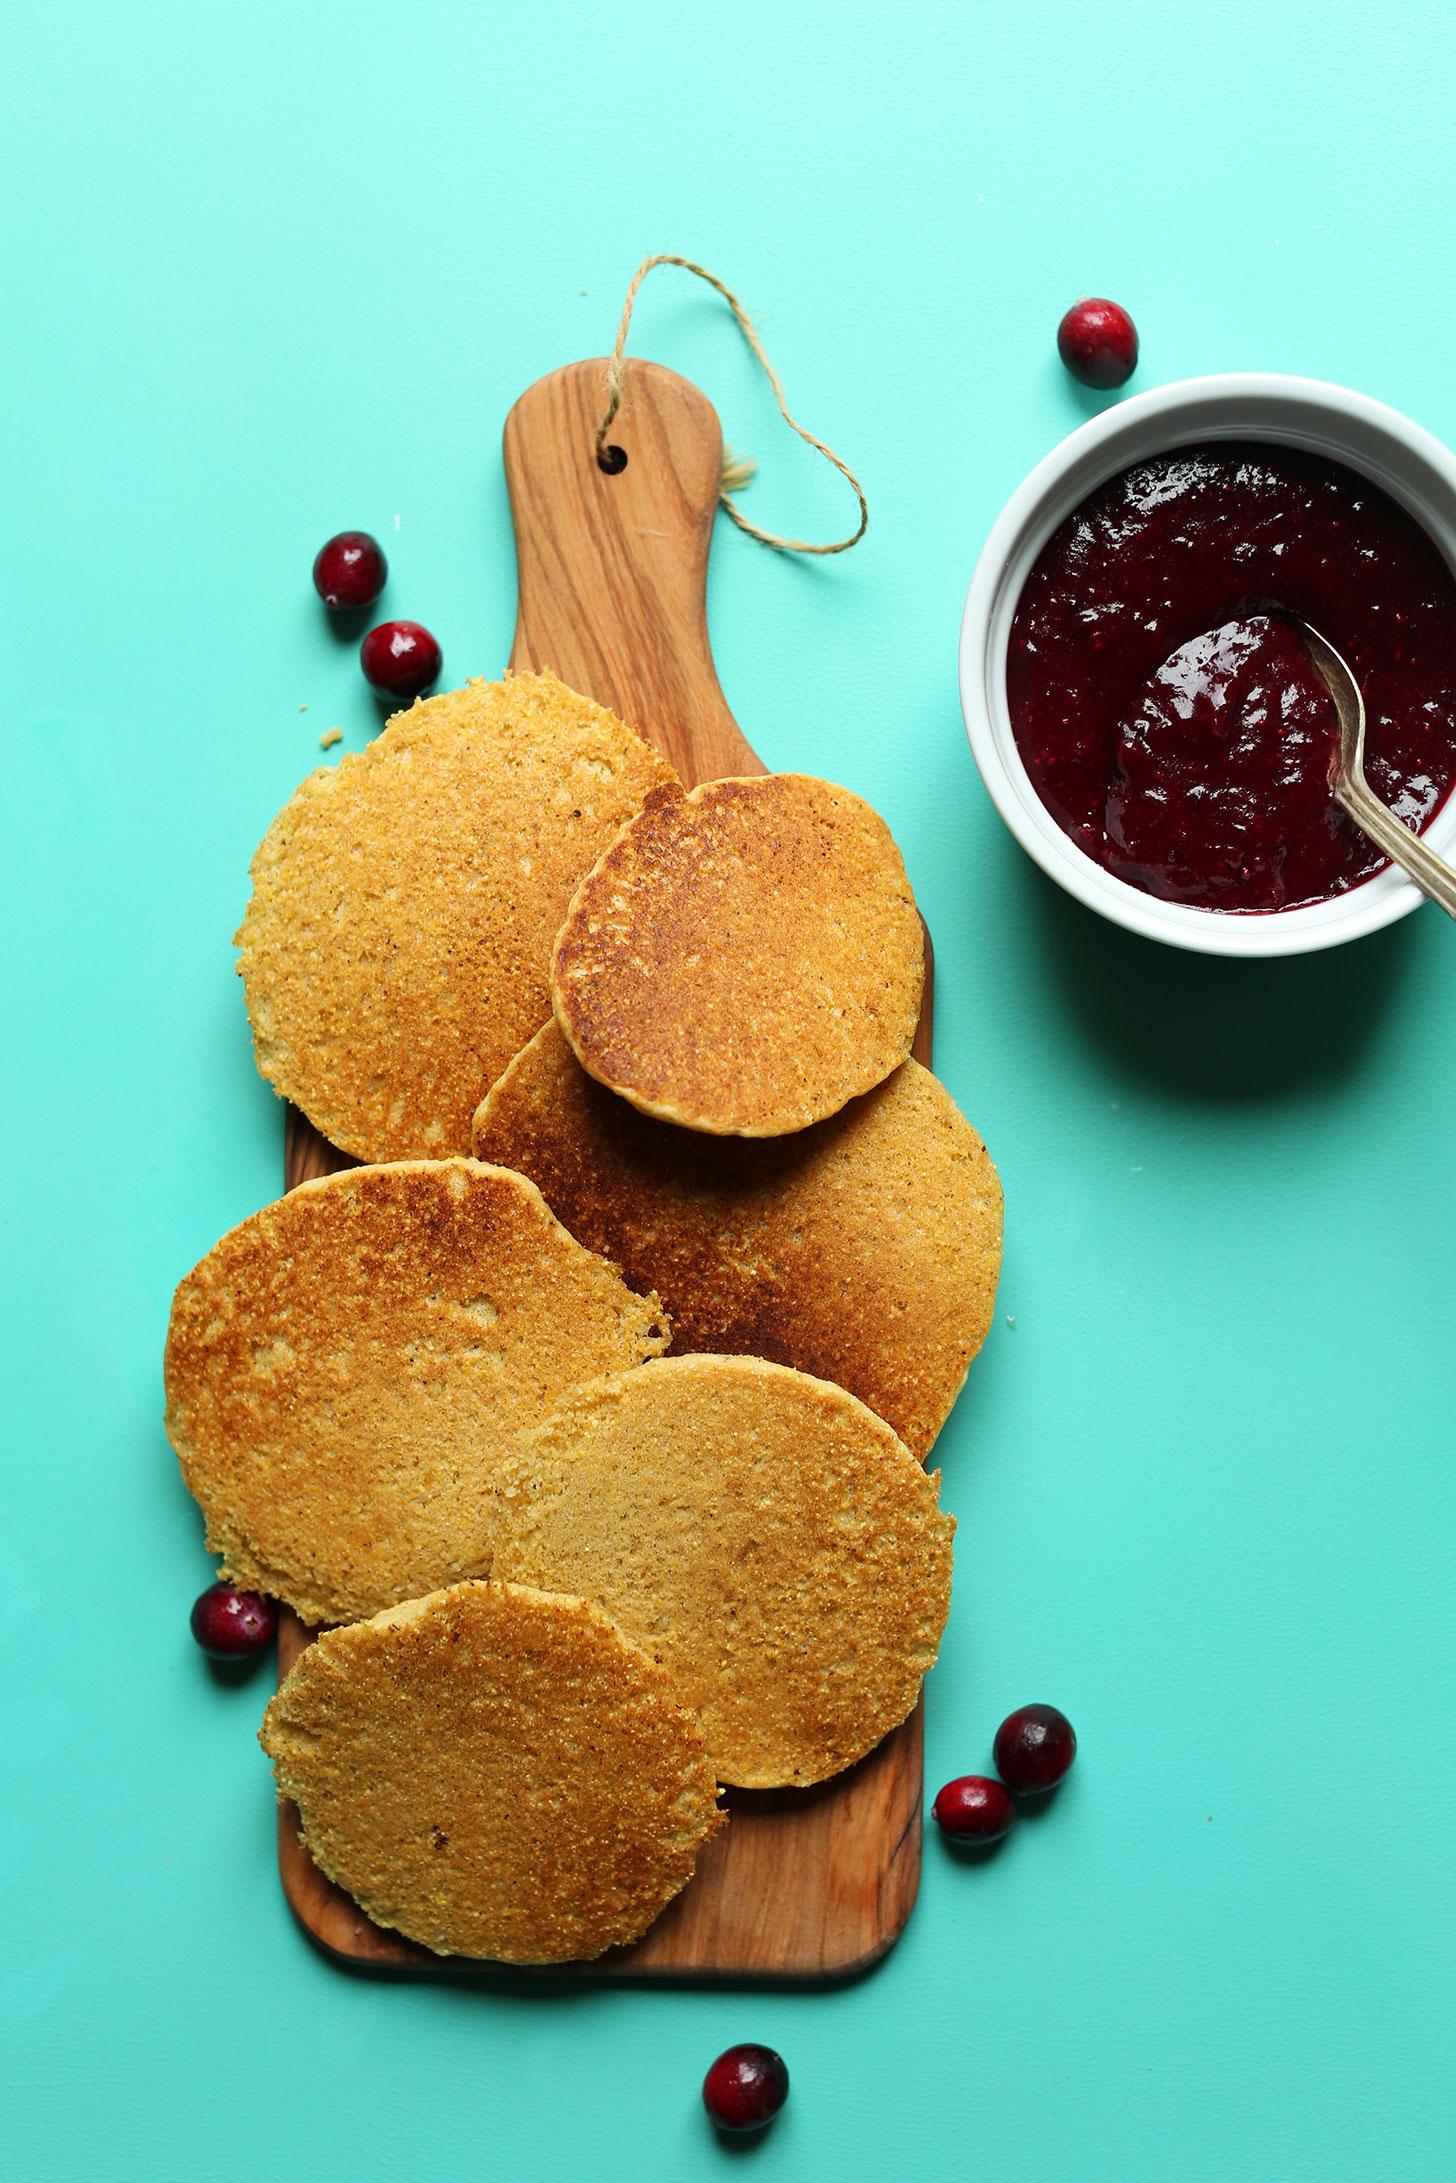 INCREDIBLE 7 Ingredient Cornmeal Pancakes with 3 ingredient Cranberry Compote #pancakes #cranberry #compote #vegan #glutenfree #minimalistbaker